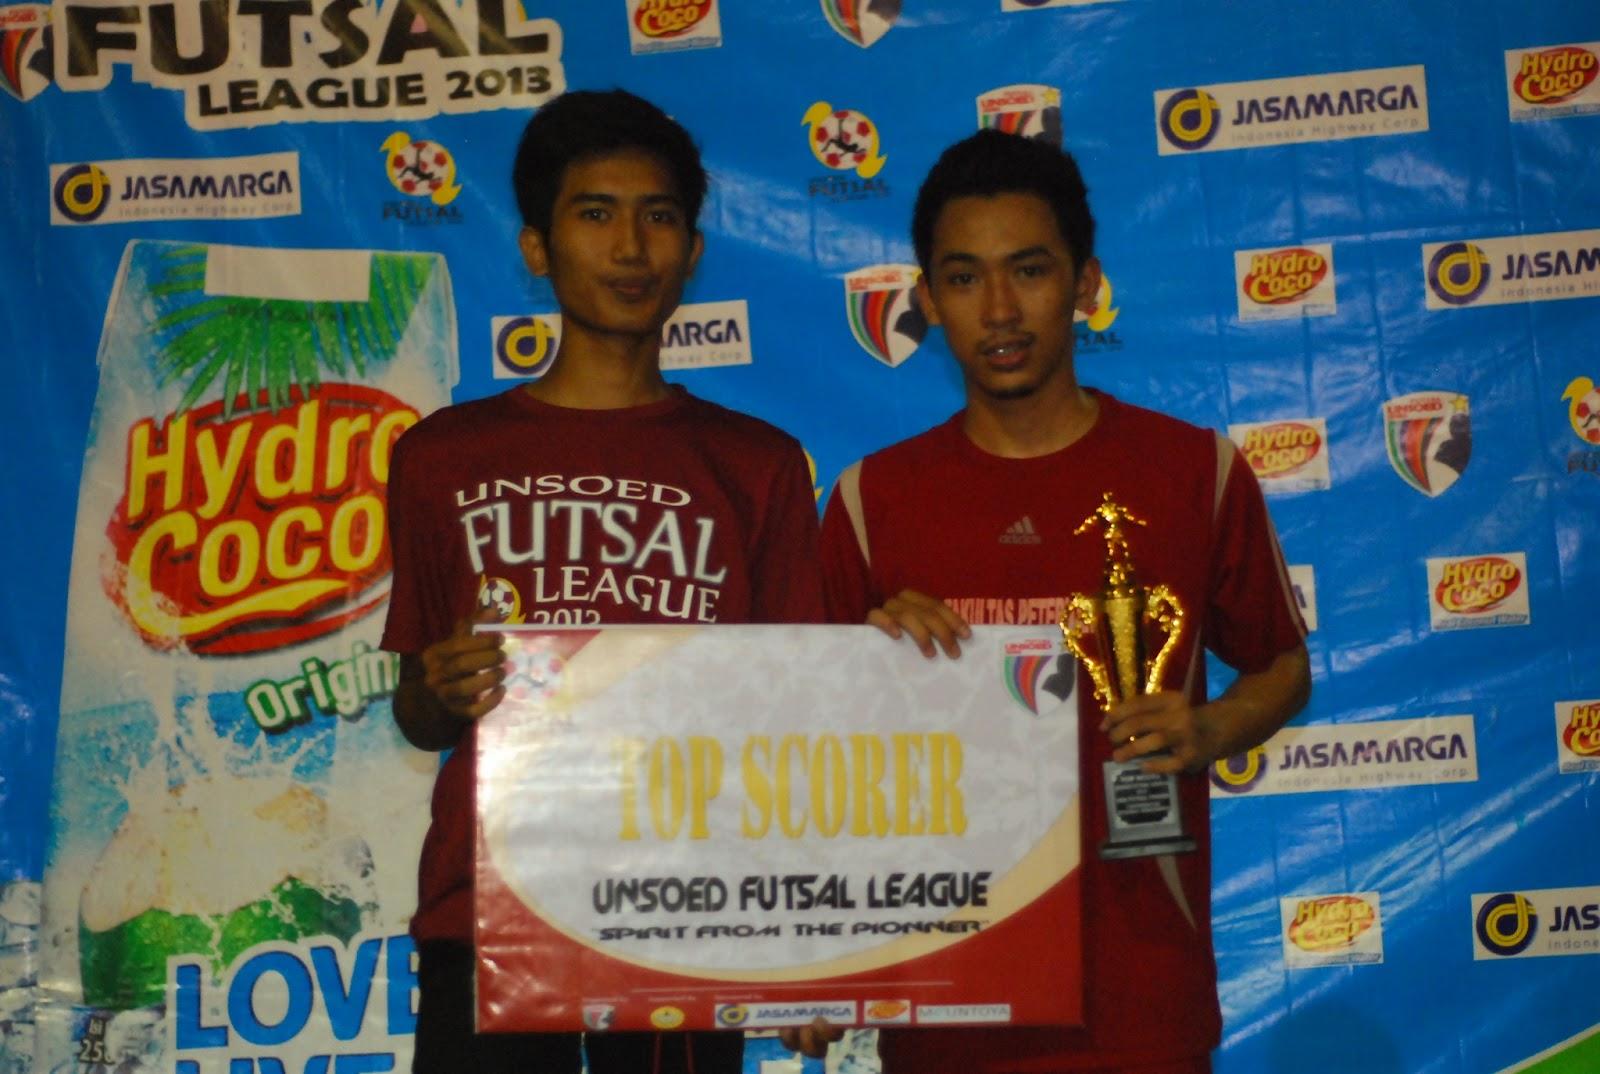 galeri   unsoed futsal league 2013